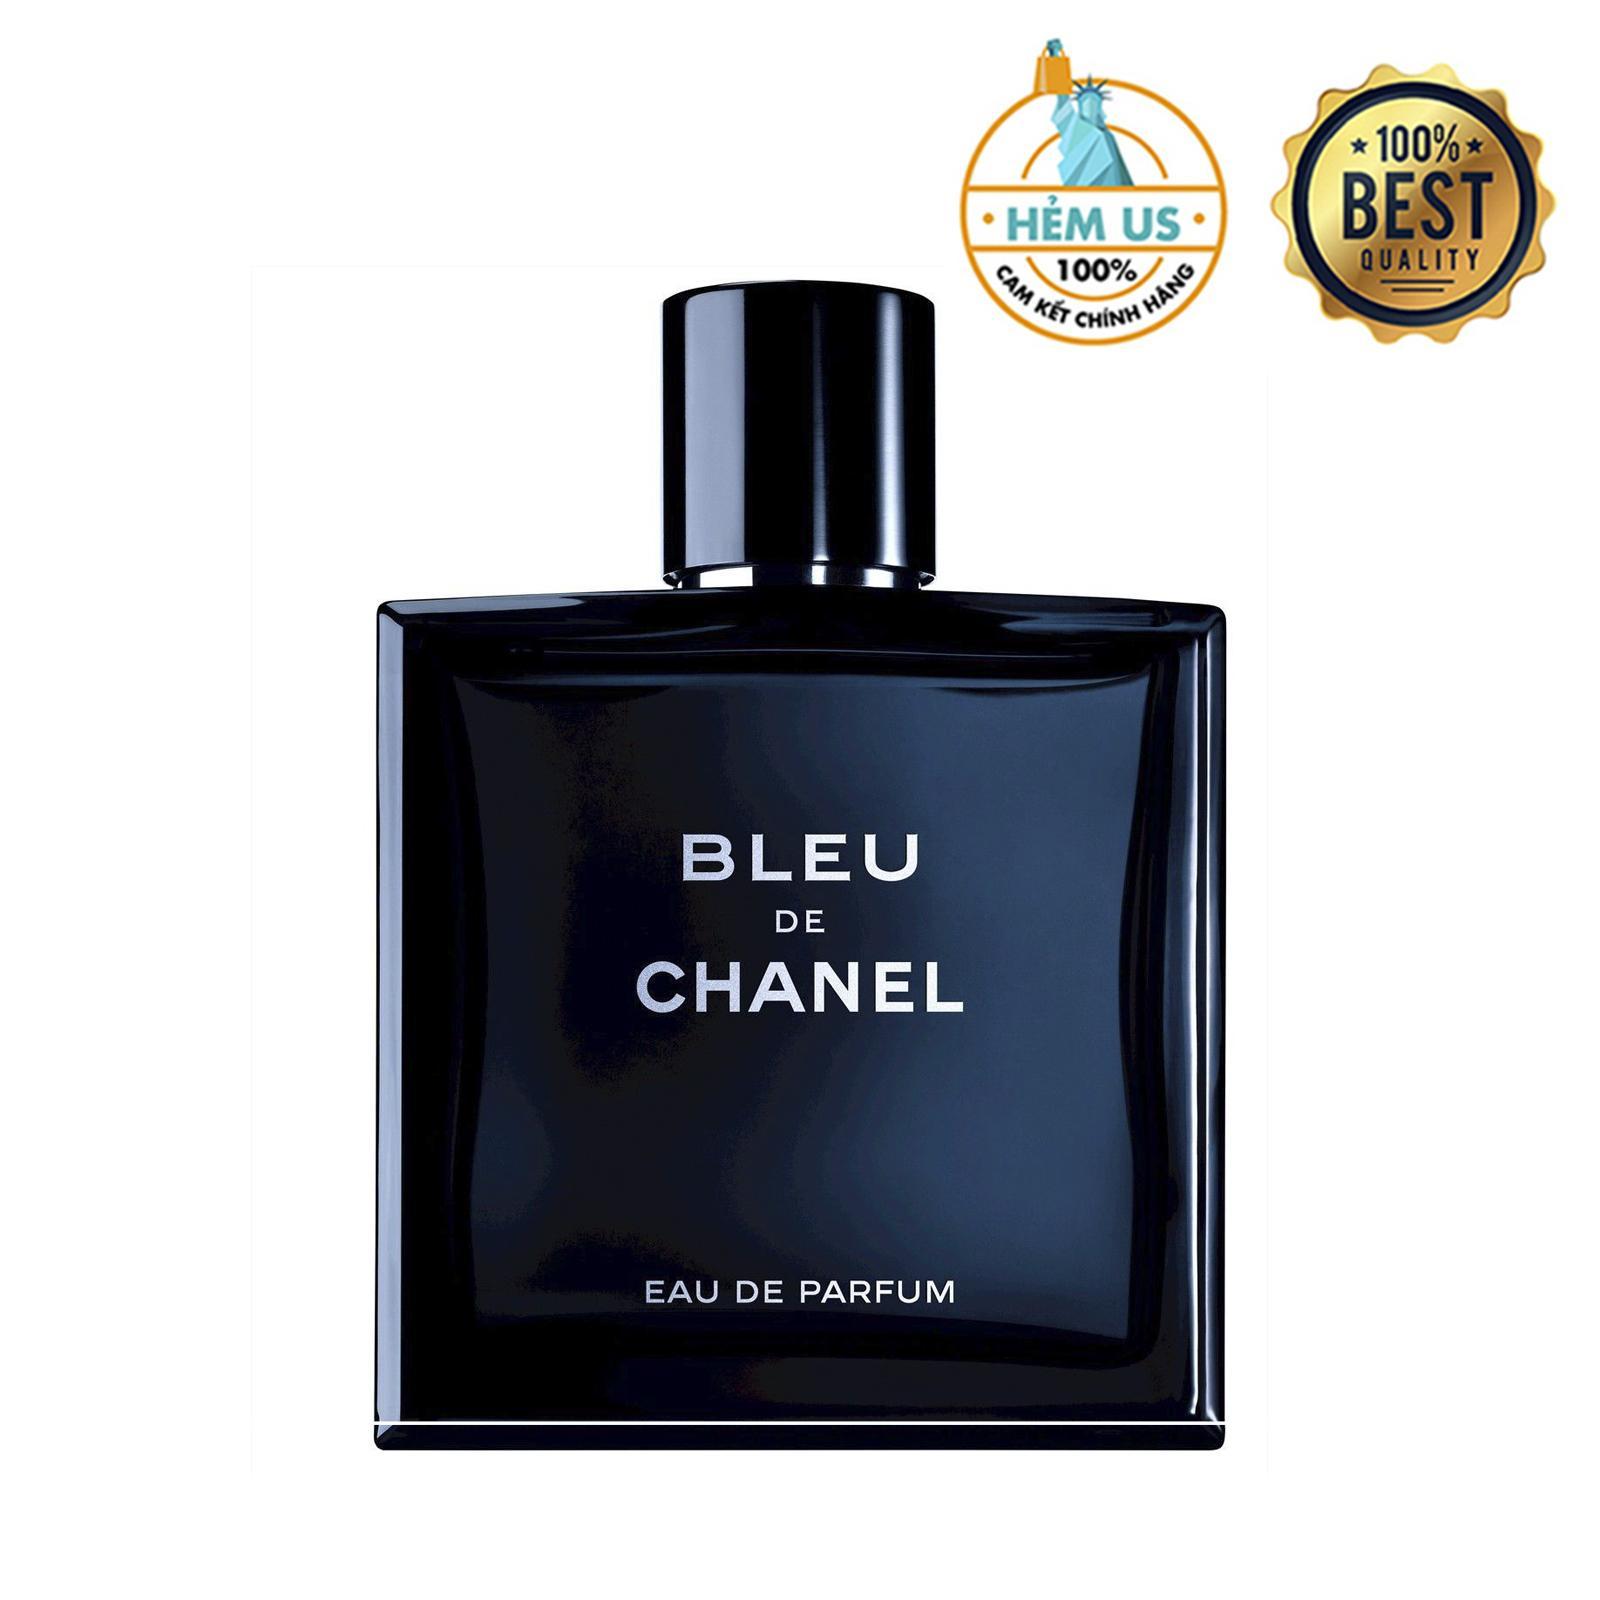 CHANEL Bleu De Chanel Eau De Parfum 100ML Hàng Chính Hãng